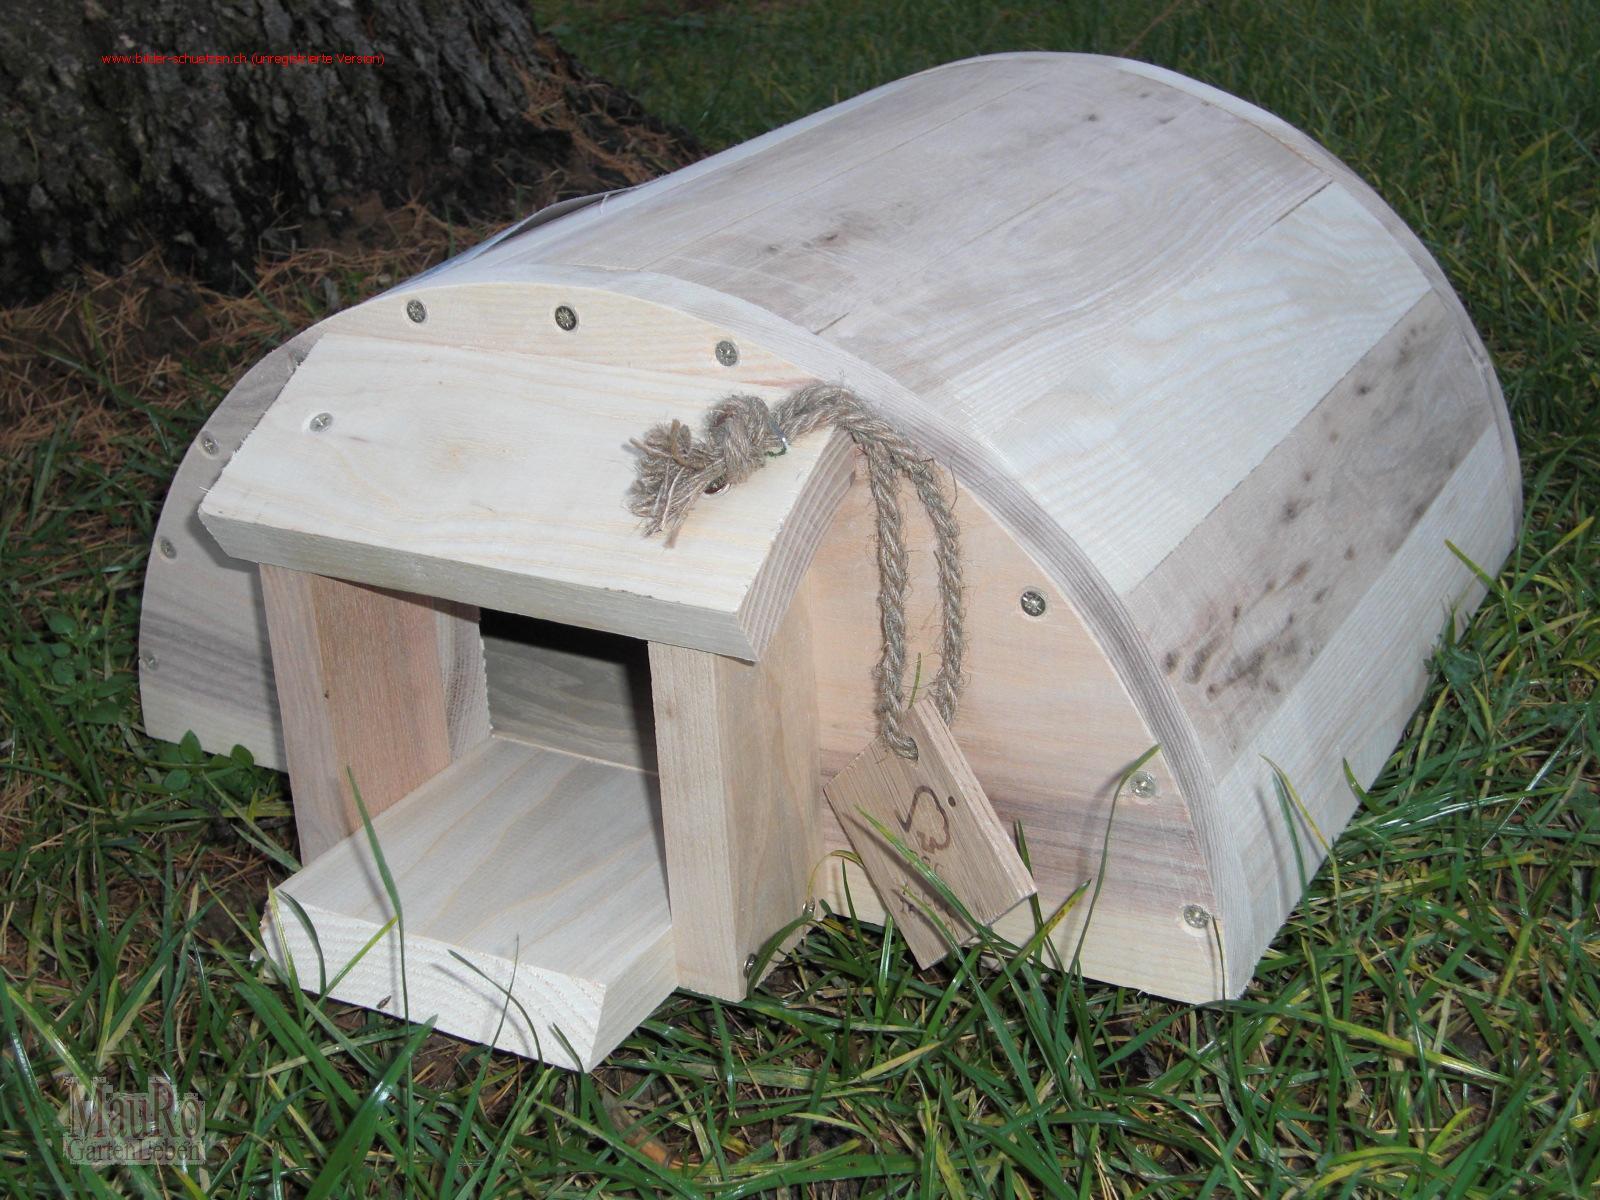 igelhaus igelwinterquartier holz mauro gartenleben. Black Bedroom Furniture Sets. Home Design Ideas